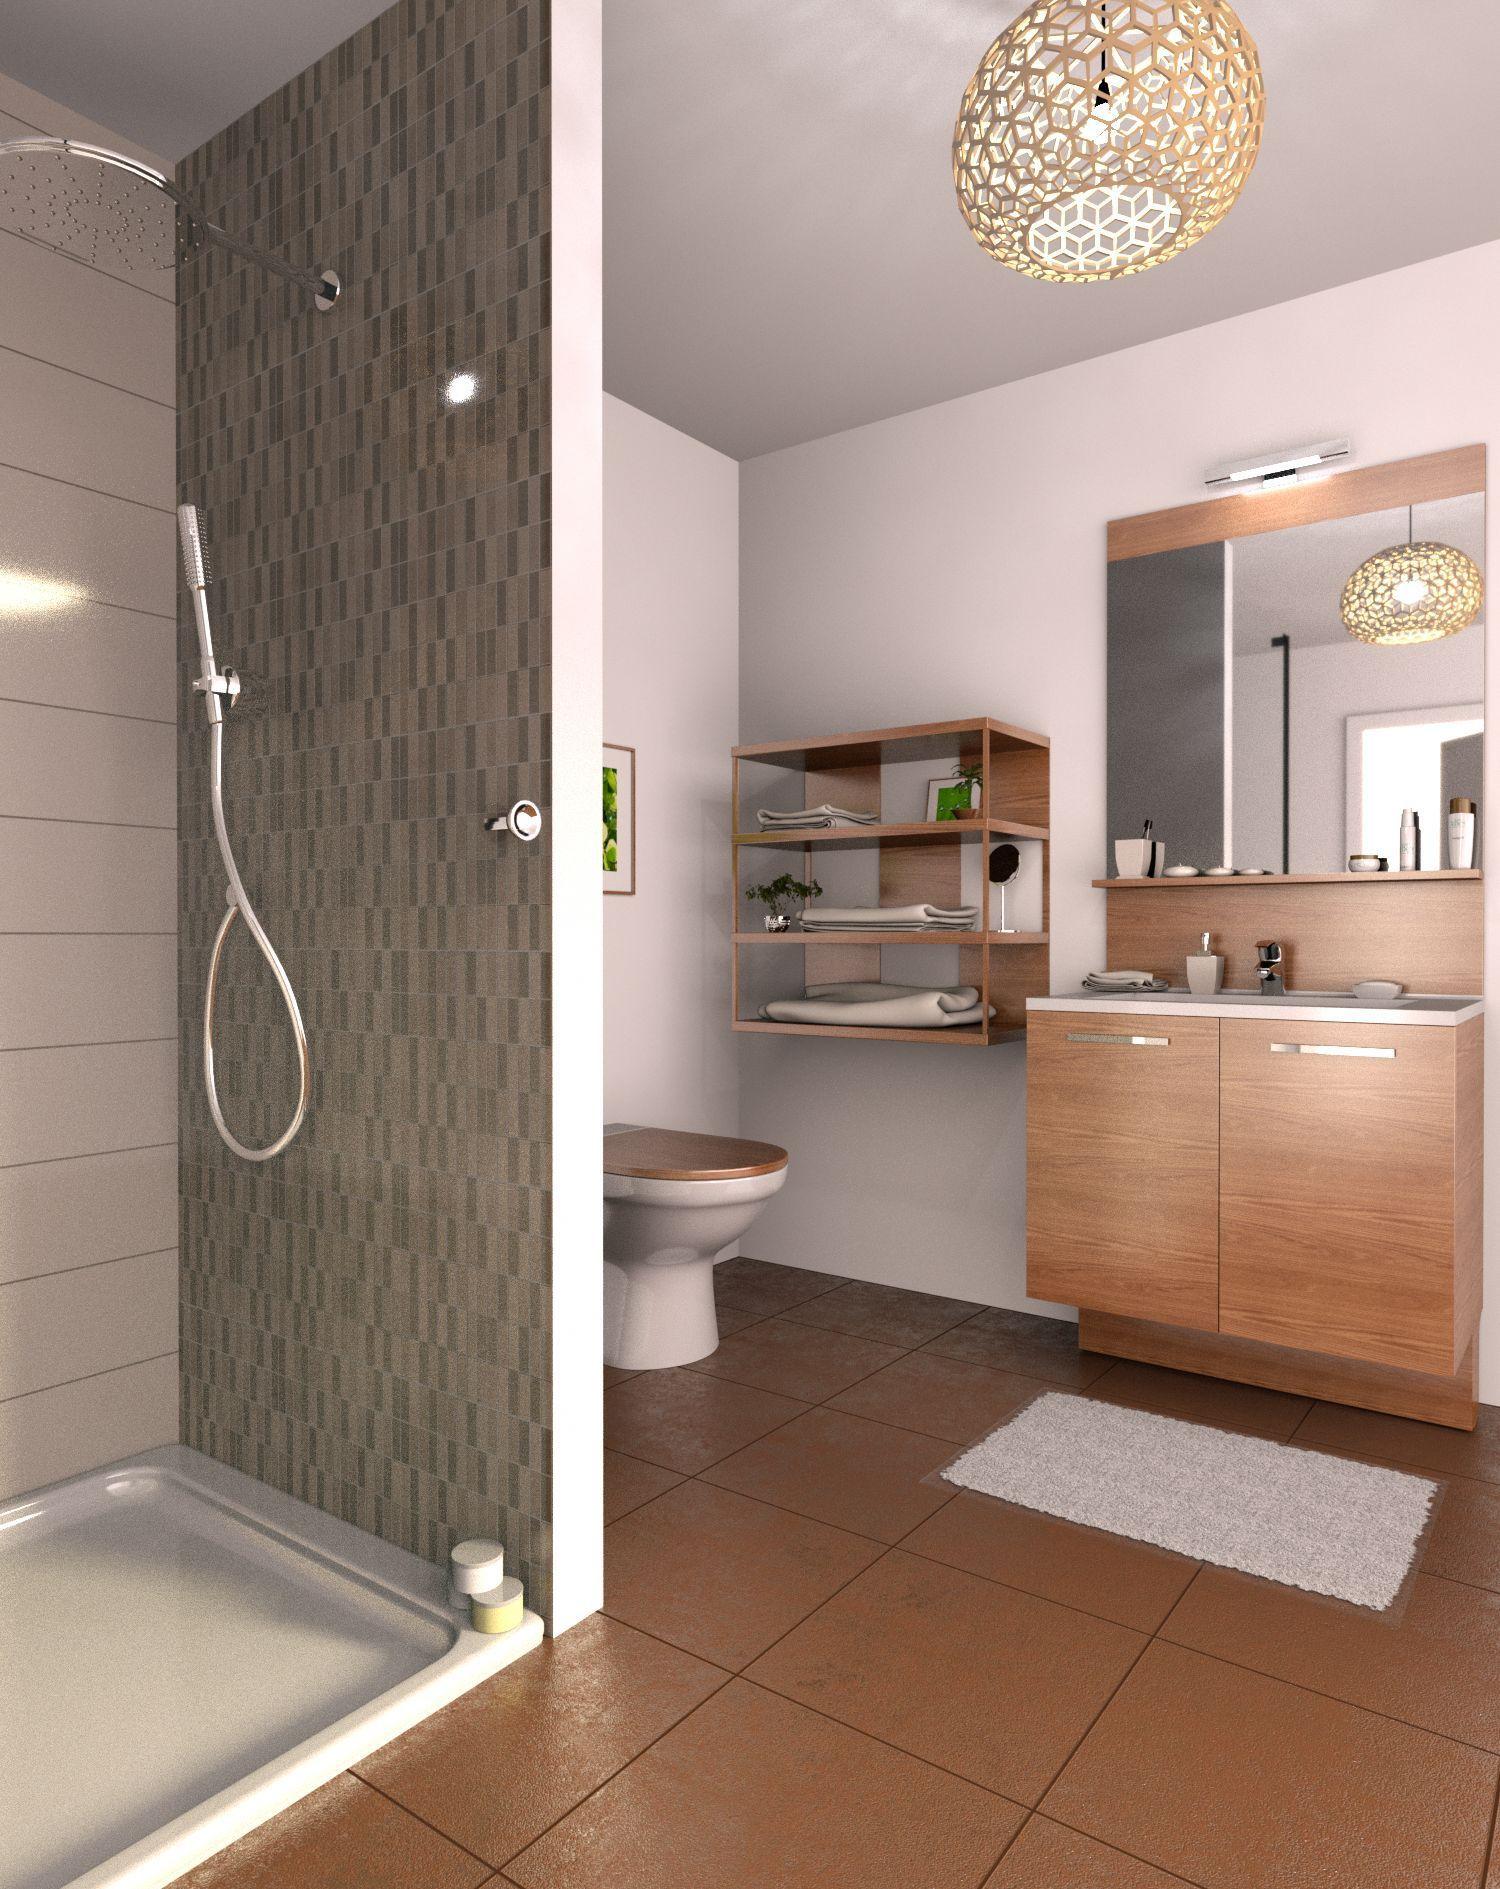 Salle de bain avec douche en céramique - image produite avec Cedar ...